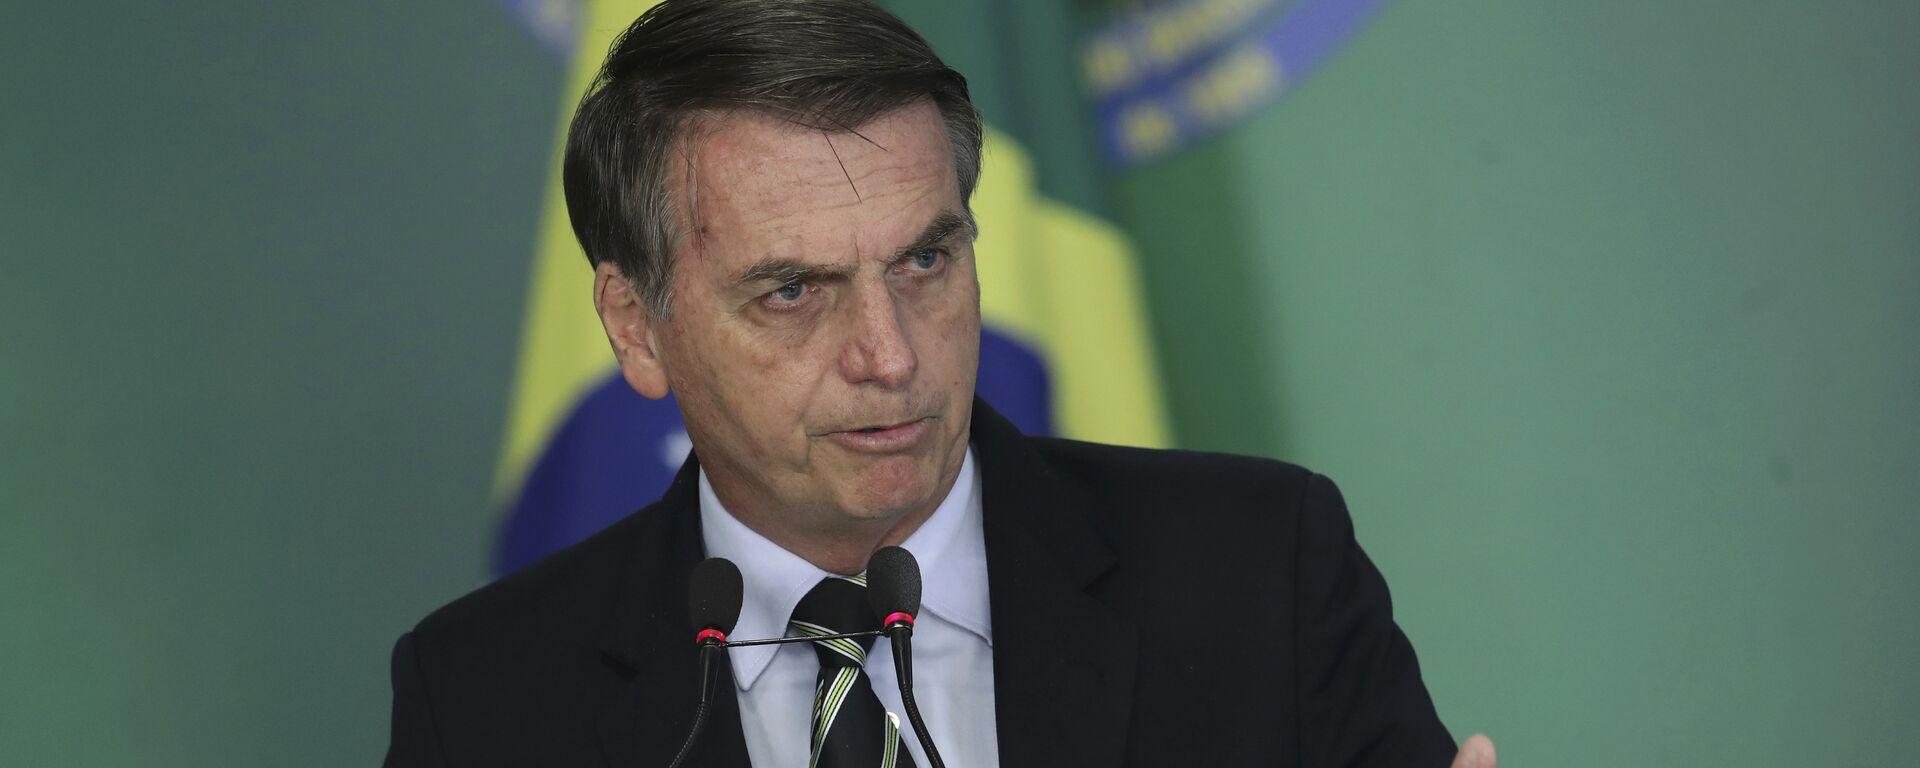 Jair Bolsonaro, presidente de Brasil - Sputnik Mundo, 1920, 22.11.2019